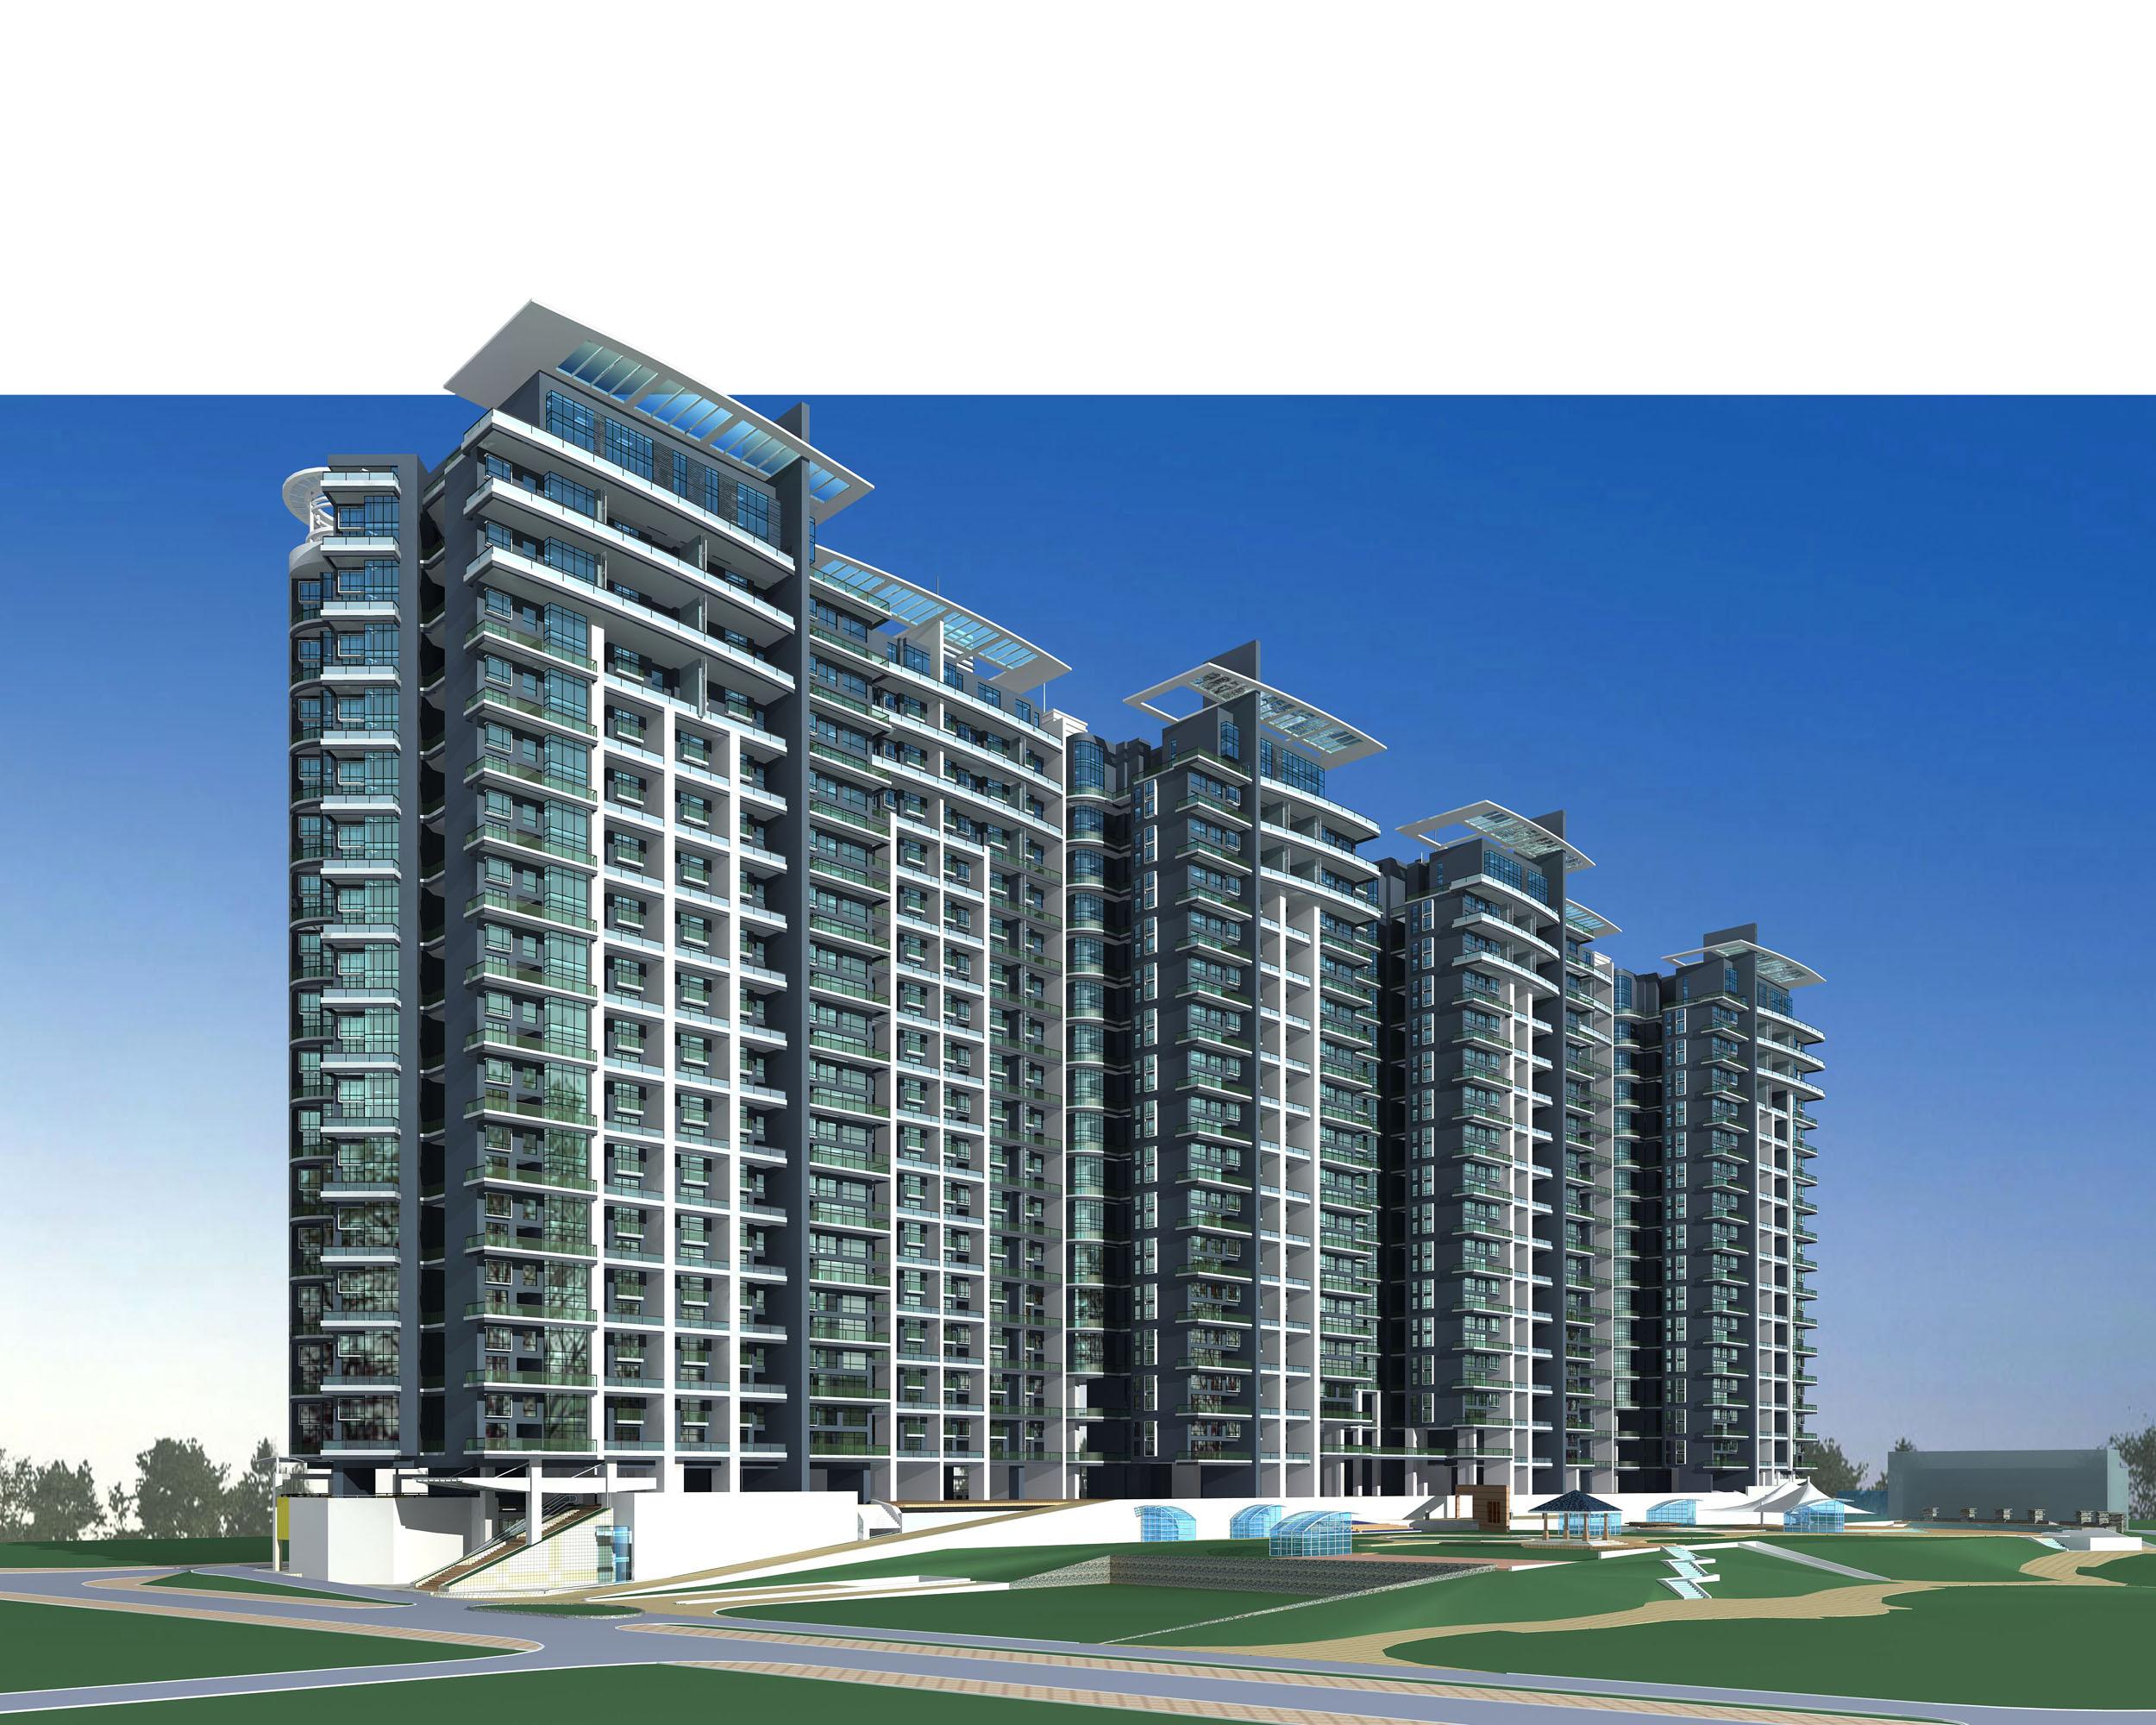 arhitektūra 261 3d modelis 3ds max 143960